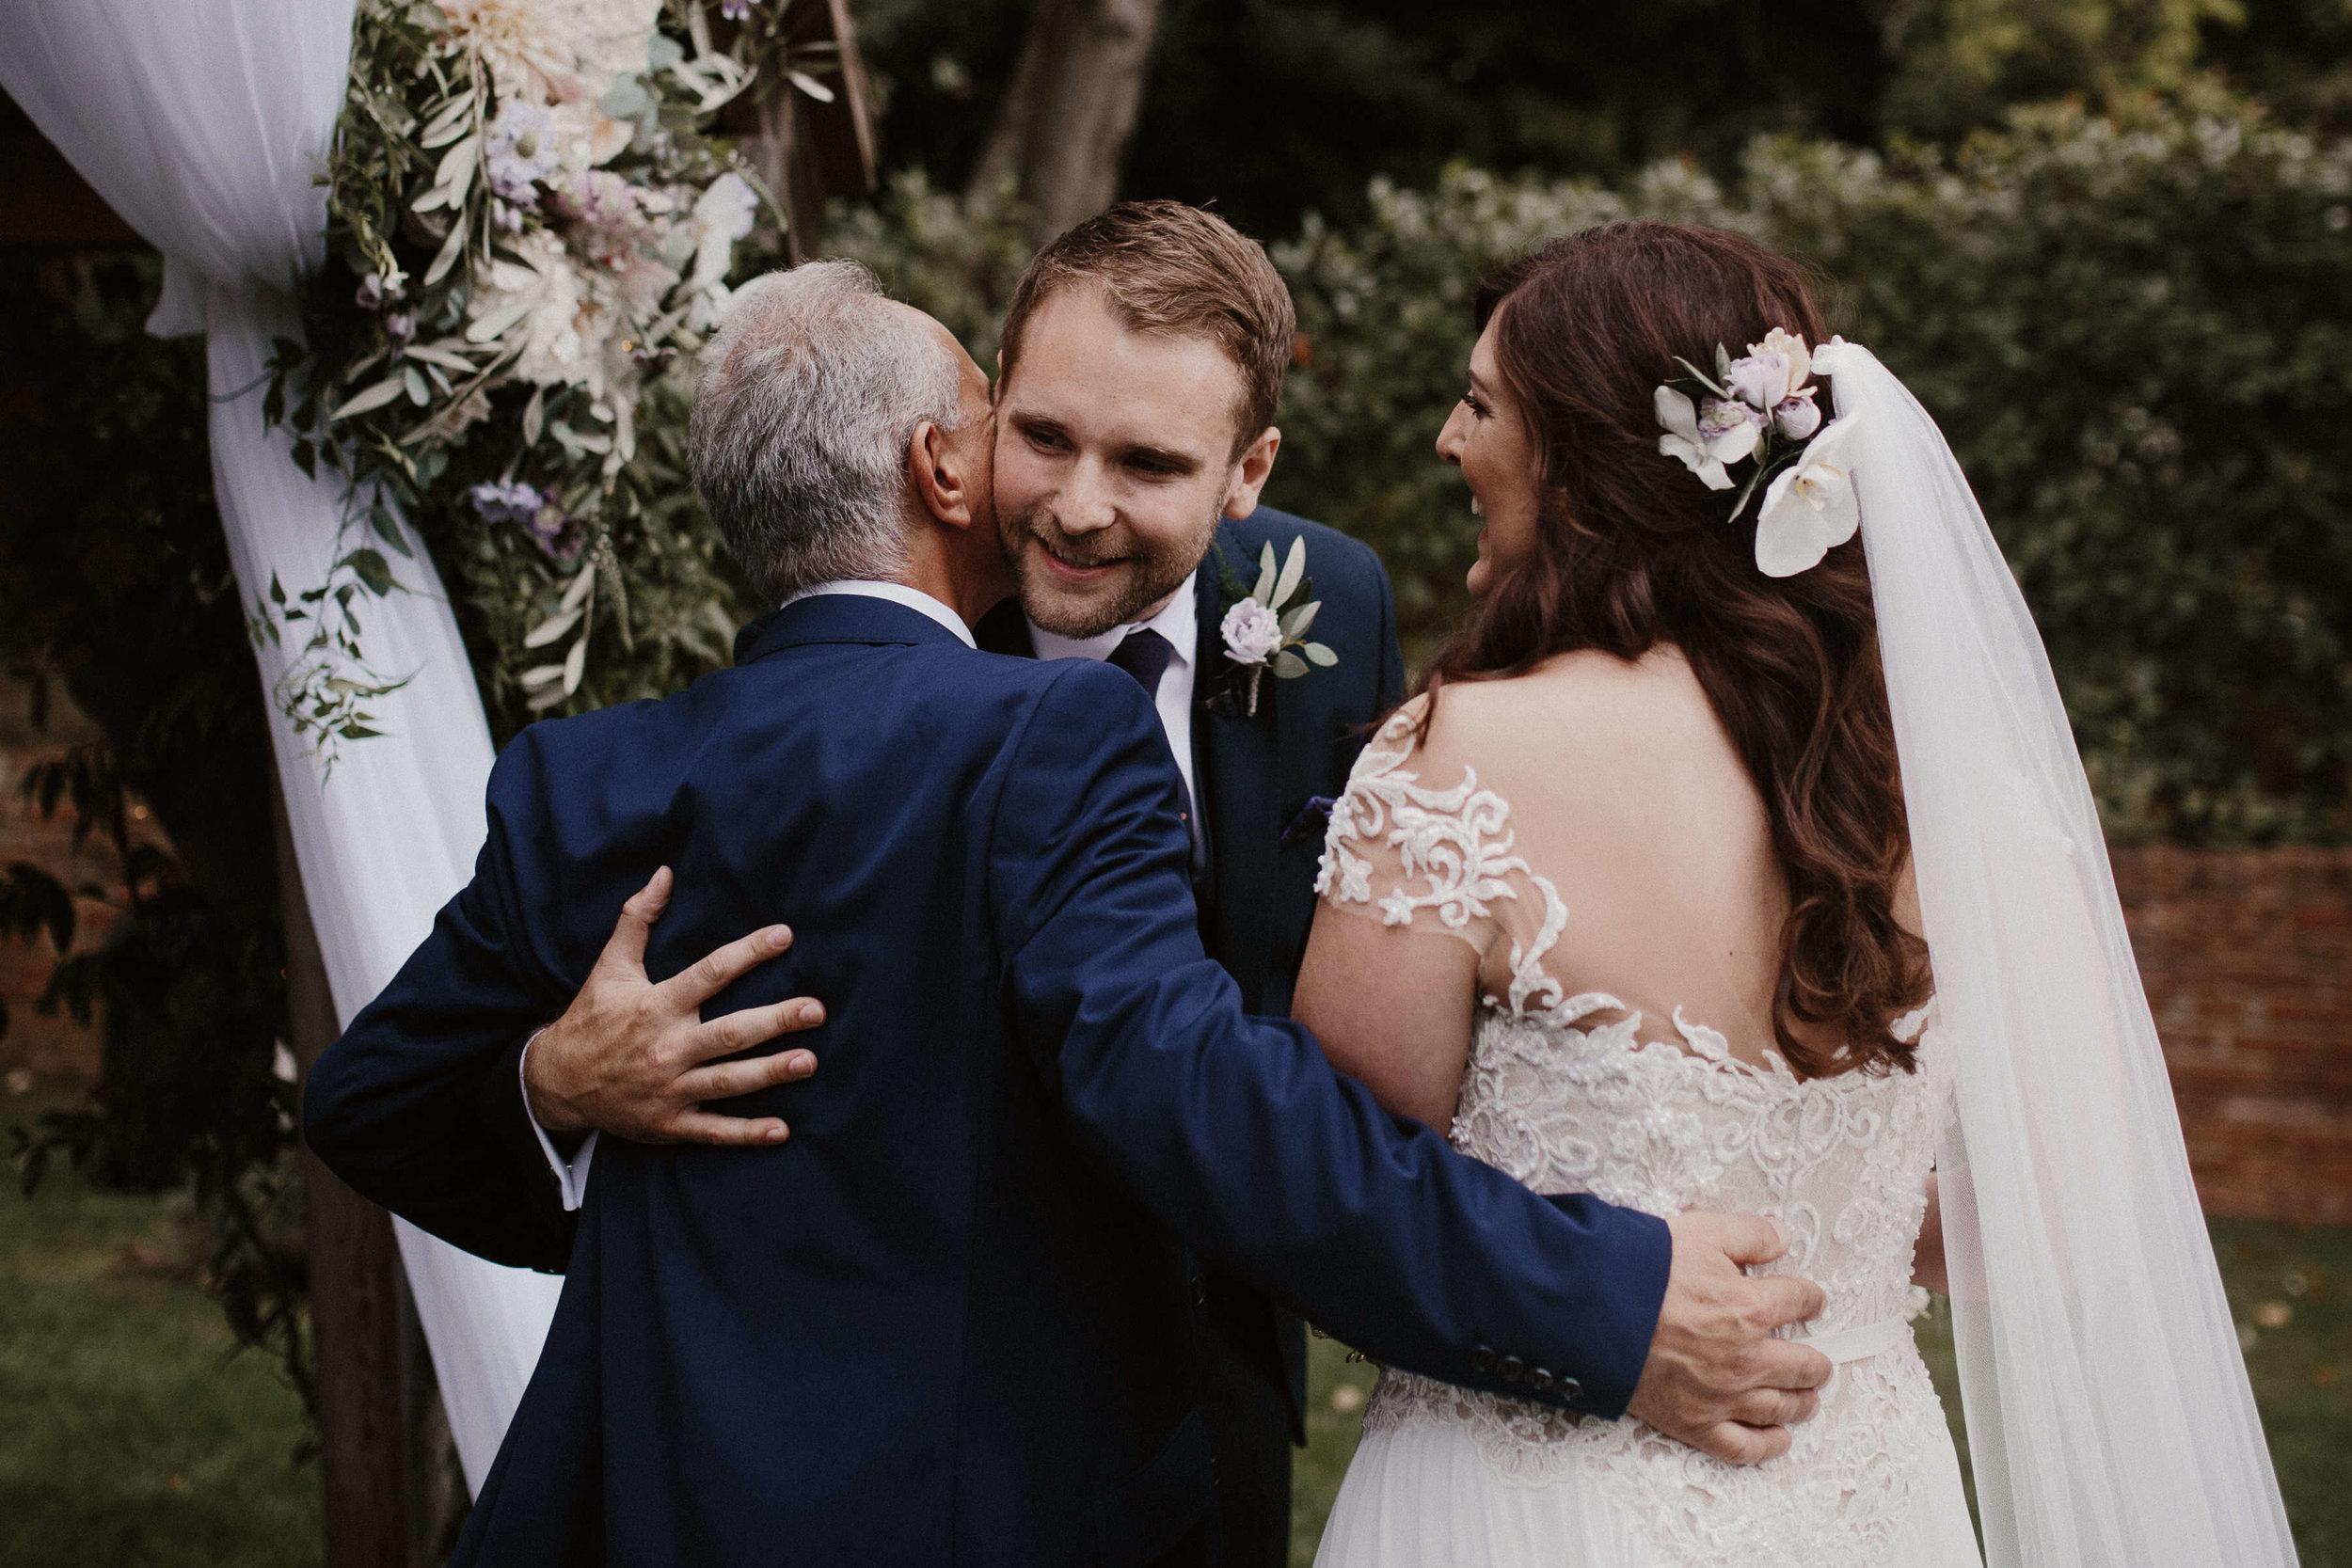 Nat and Tom - 05 - Ceremony - Sara Lincoln Photography-37.jpg